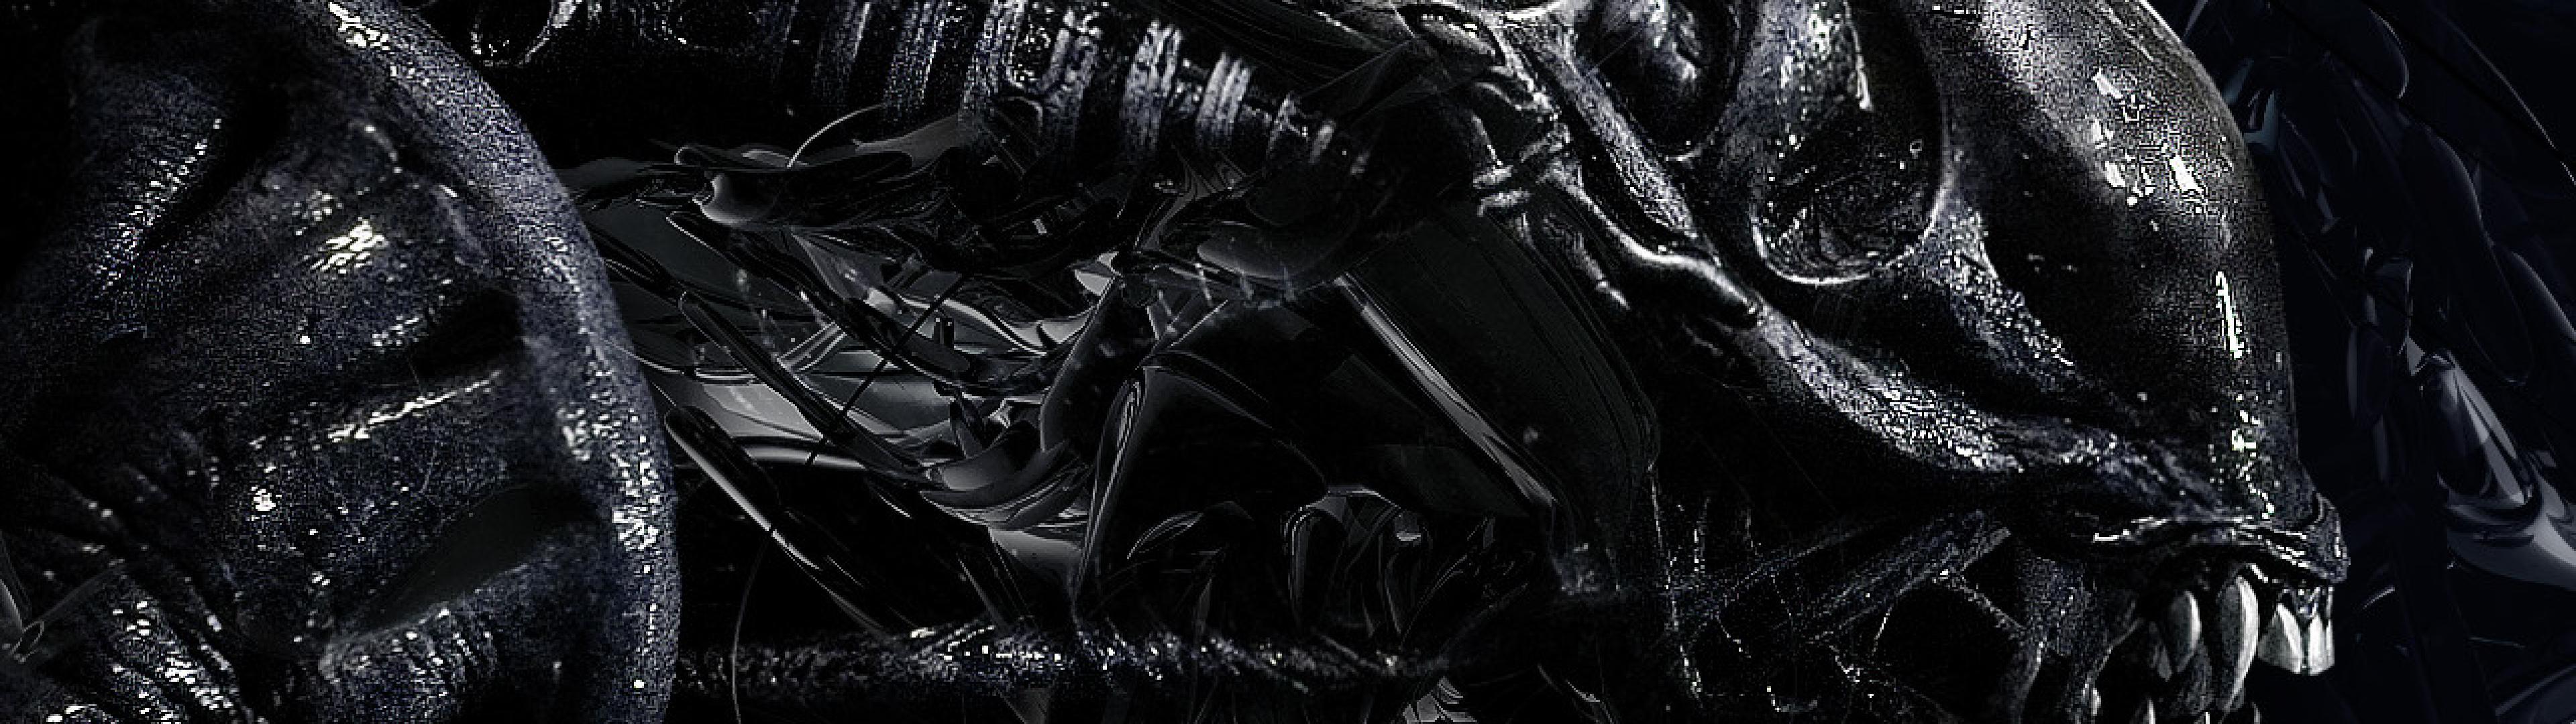 alien hd iphone wallpapers - photo #35